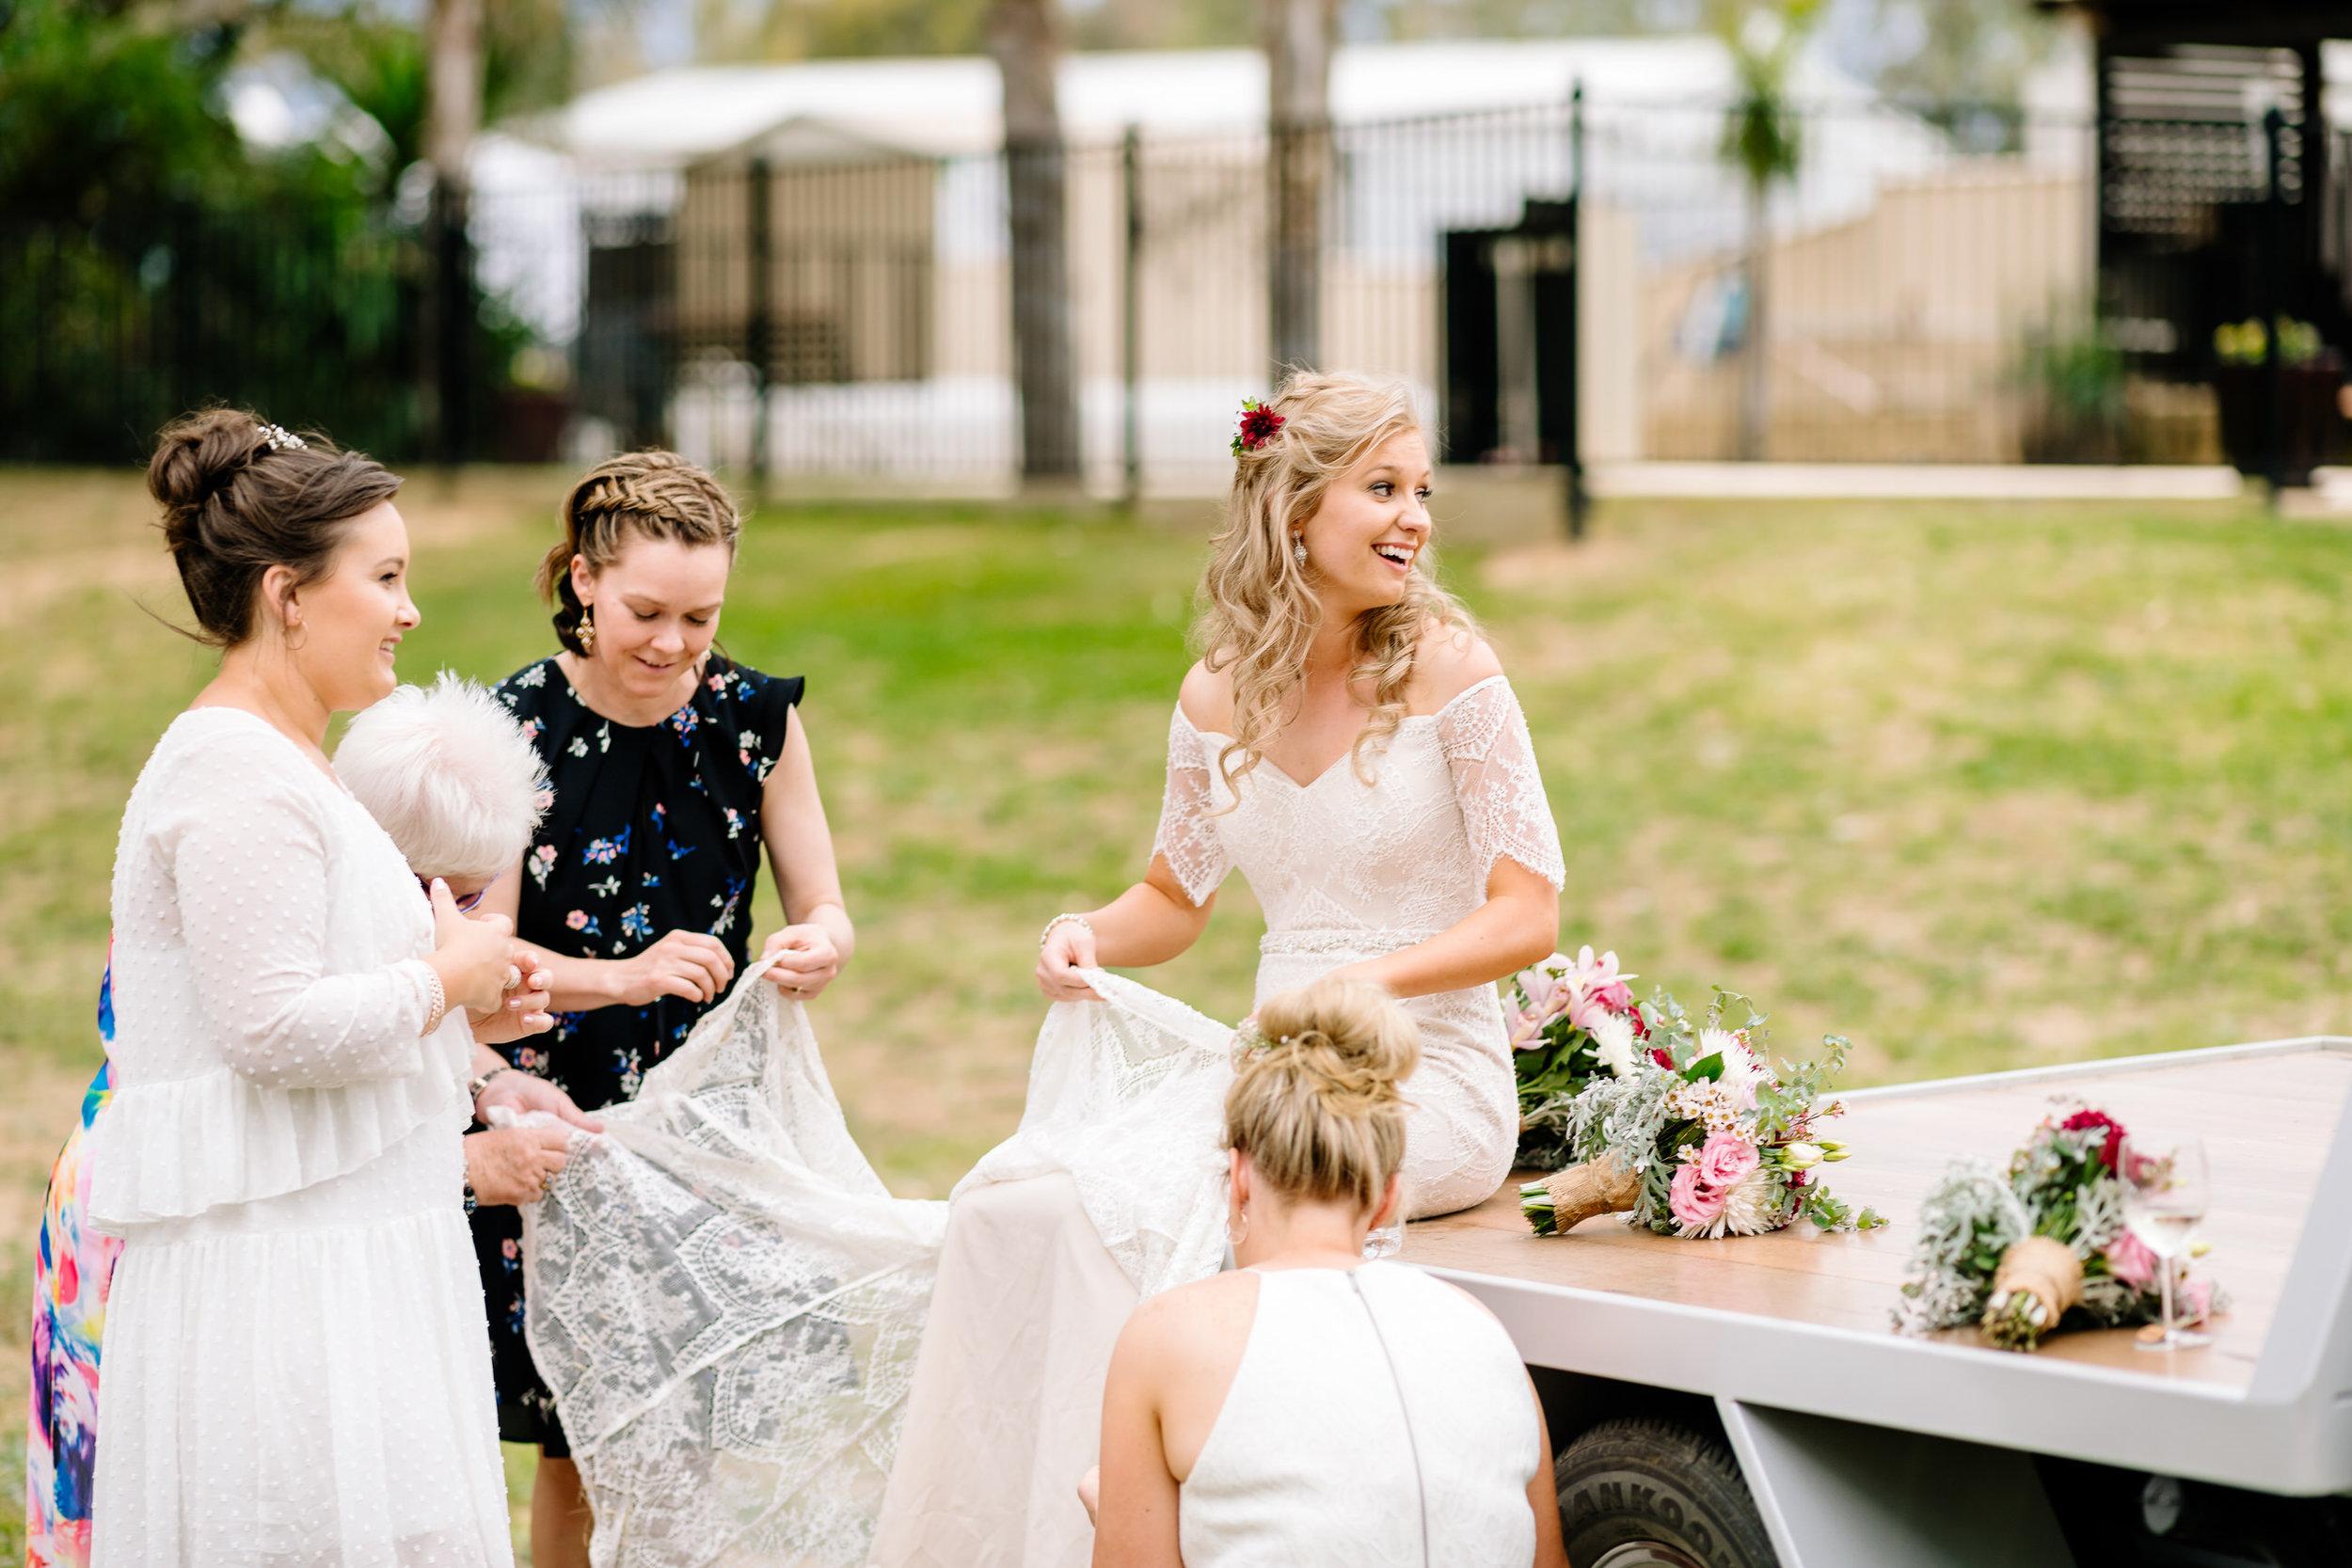 Justin_And_Jim_Photography_Backyard_Wedding188.JPG